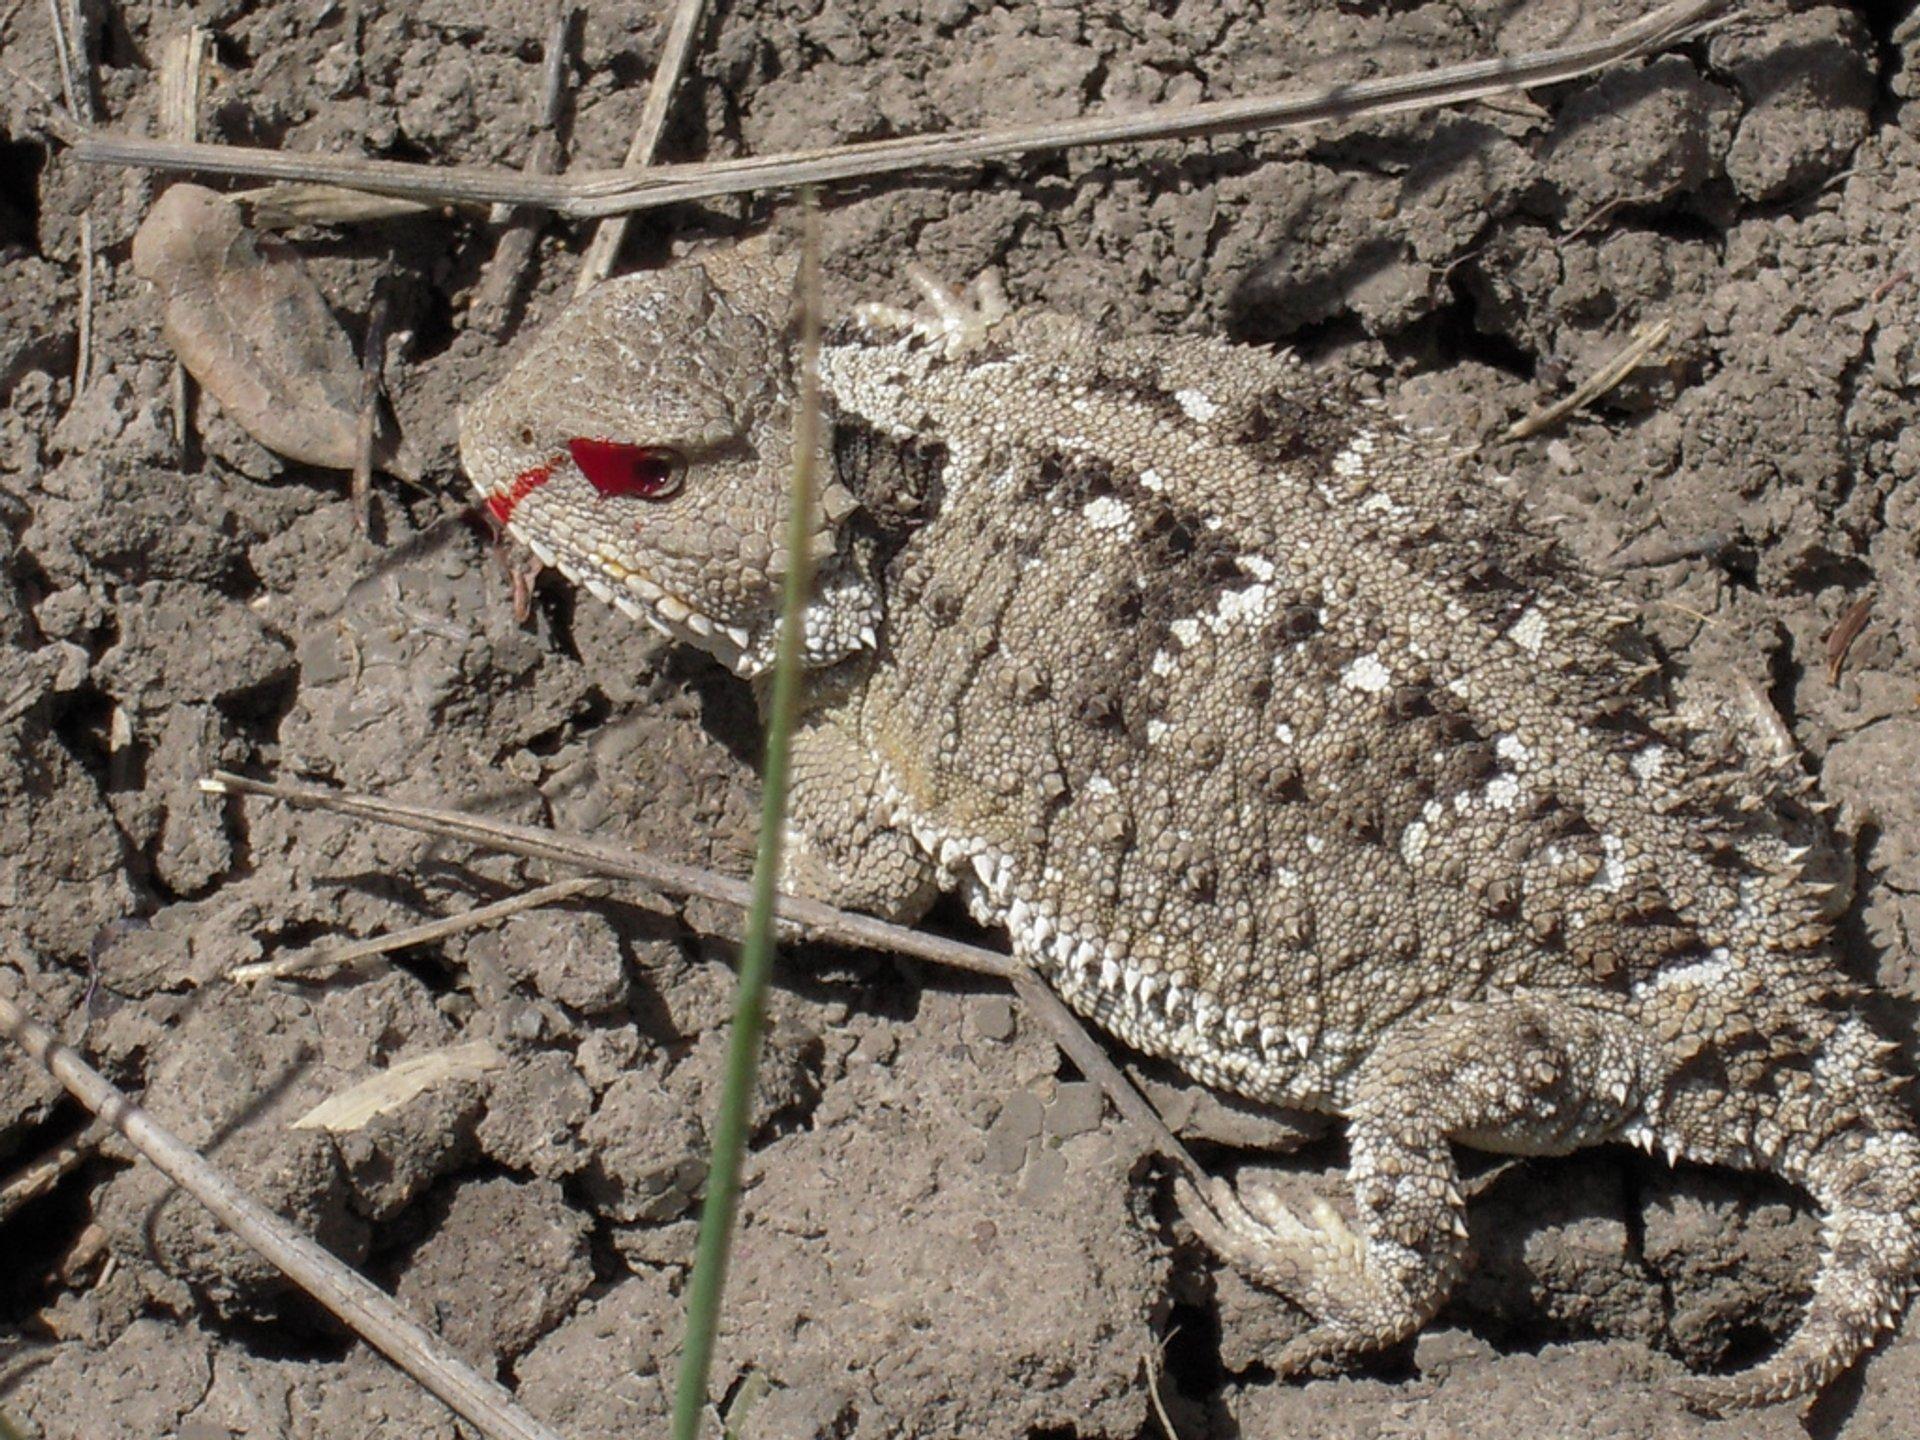 Short-horned Lizard in Charles M Russell National Wildlife Refuge, eastern Montana, USA 2020